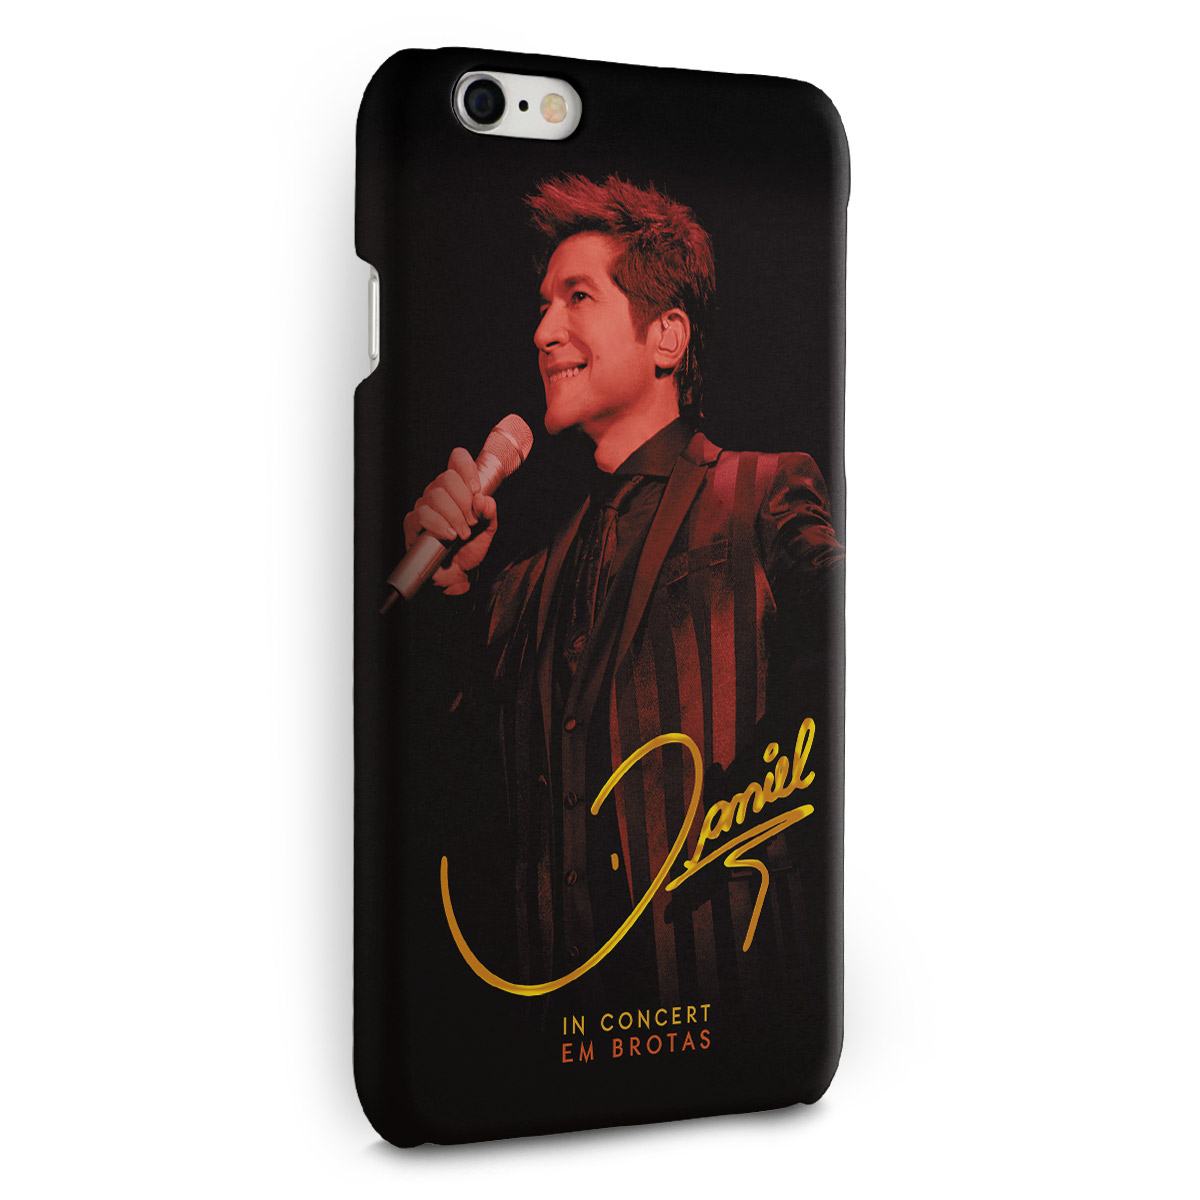 Capa de iPhone 6/6S PLUS Daniel in Concert